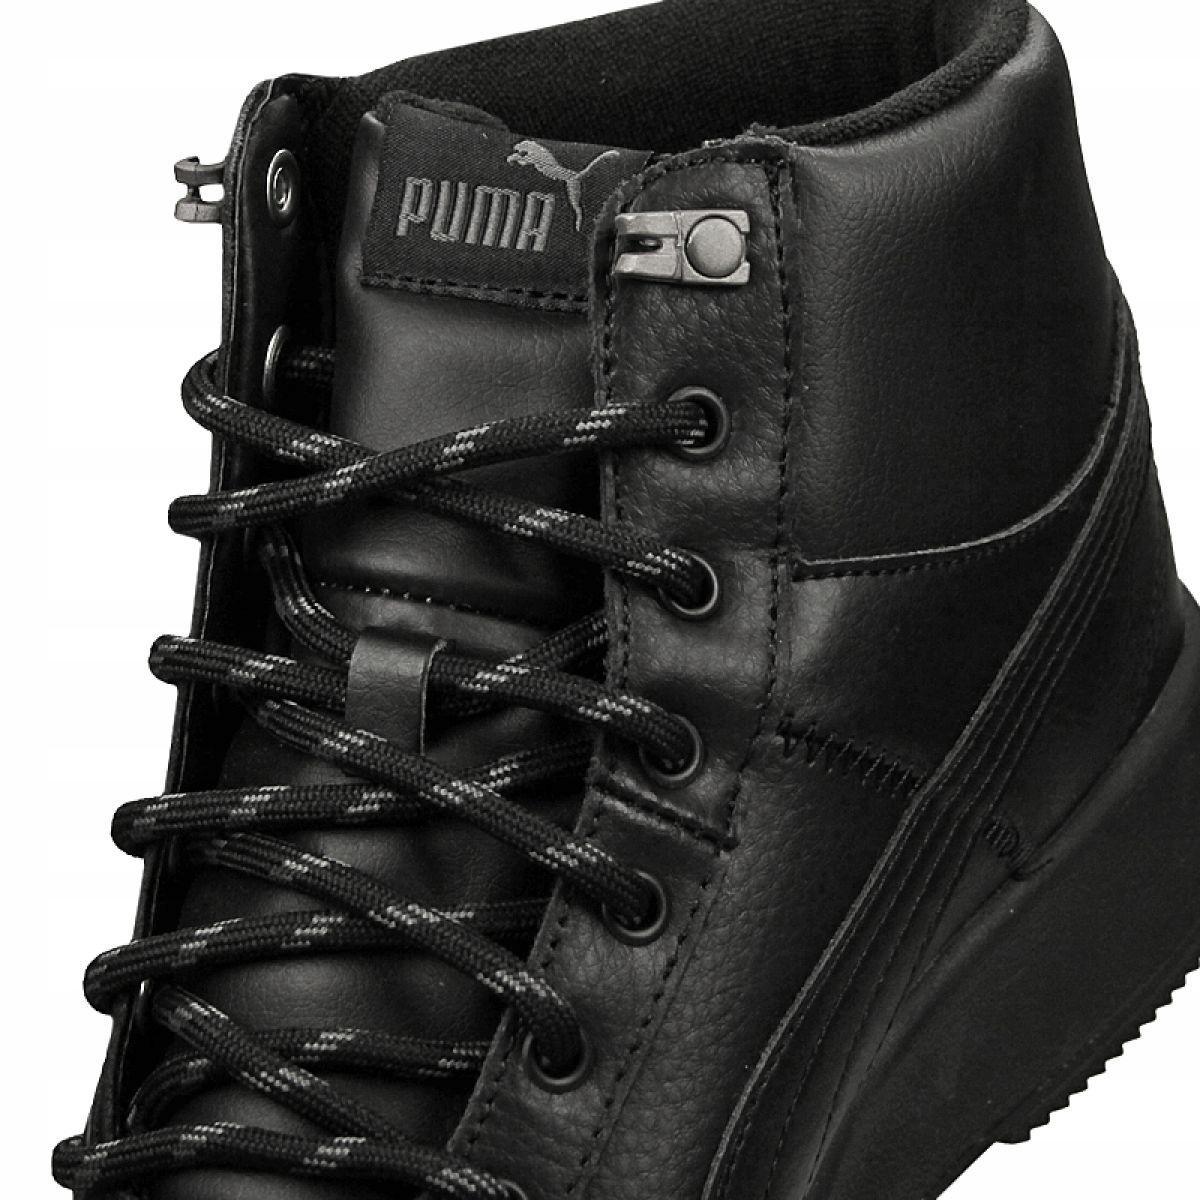 Puma Tarrenz Sb Puretex M 370552 01 cipő fekete